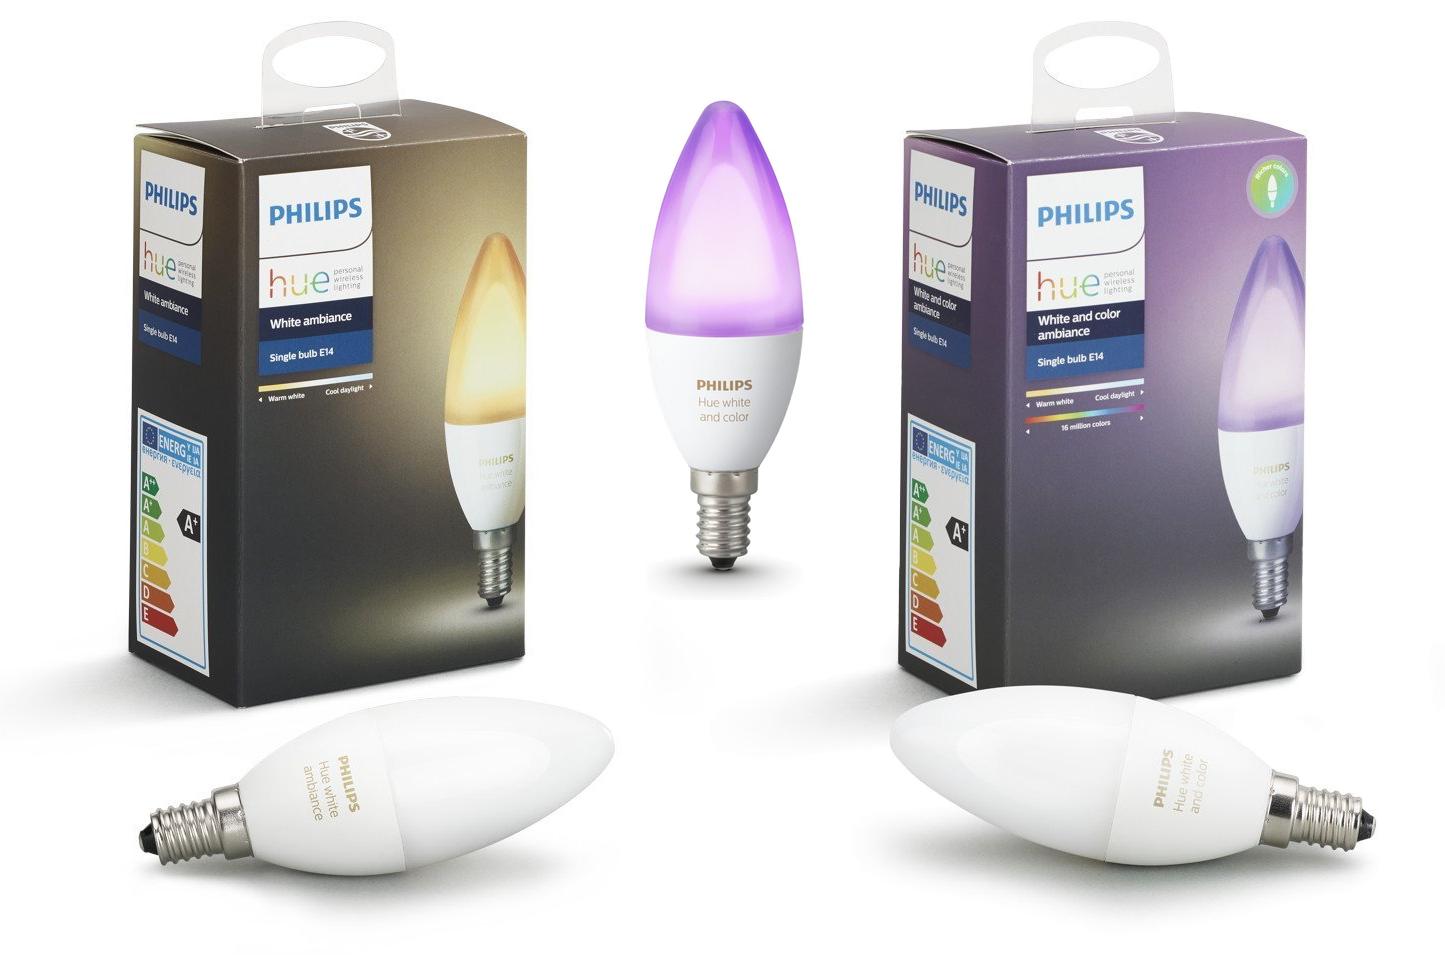 Lampadine led smart philips hue e14 lampade led online for Nuove lampadine led